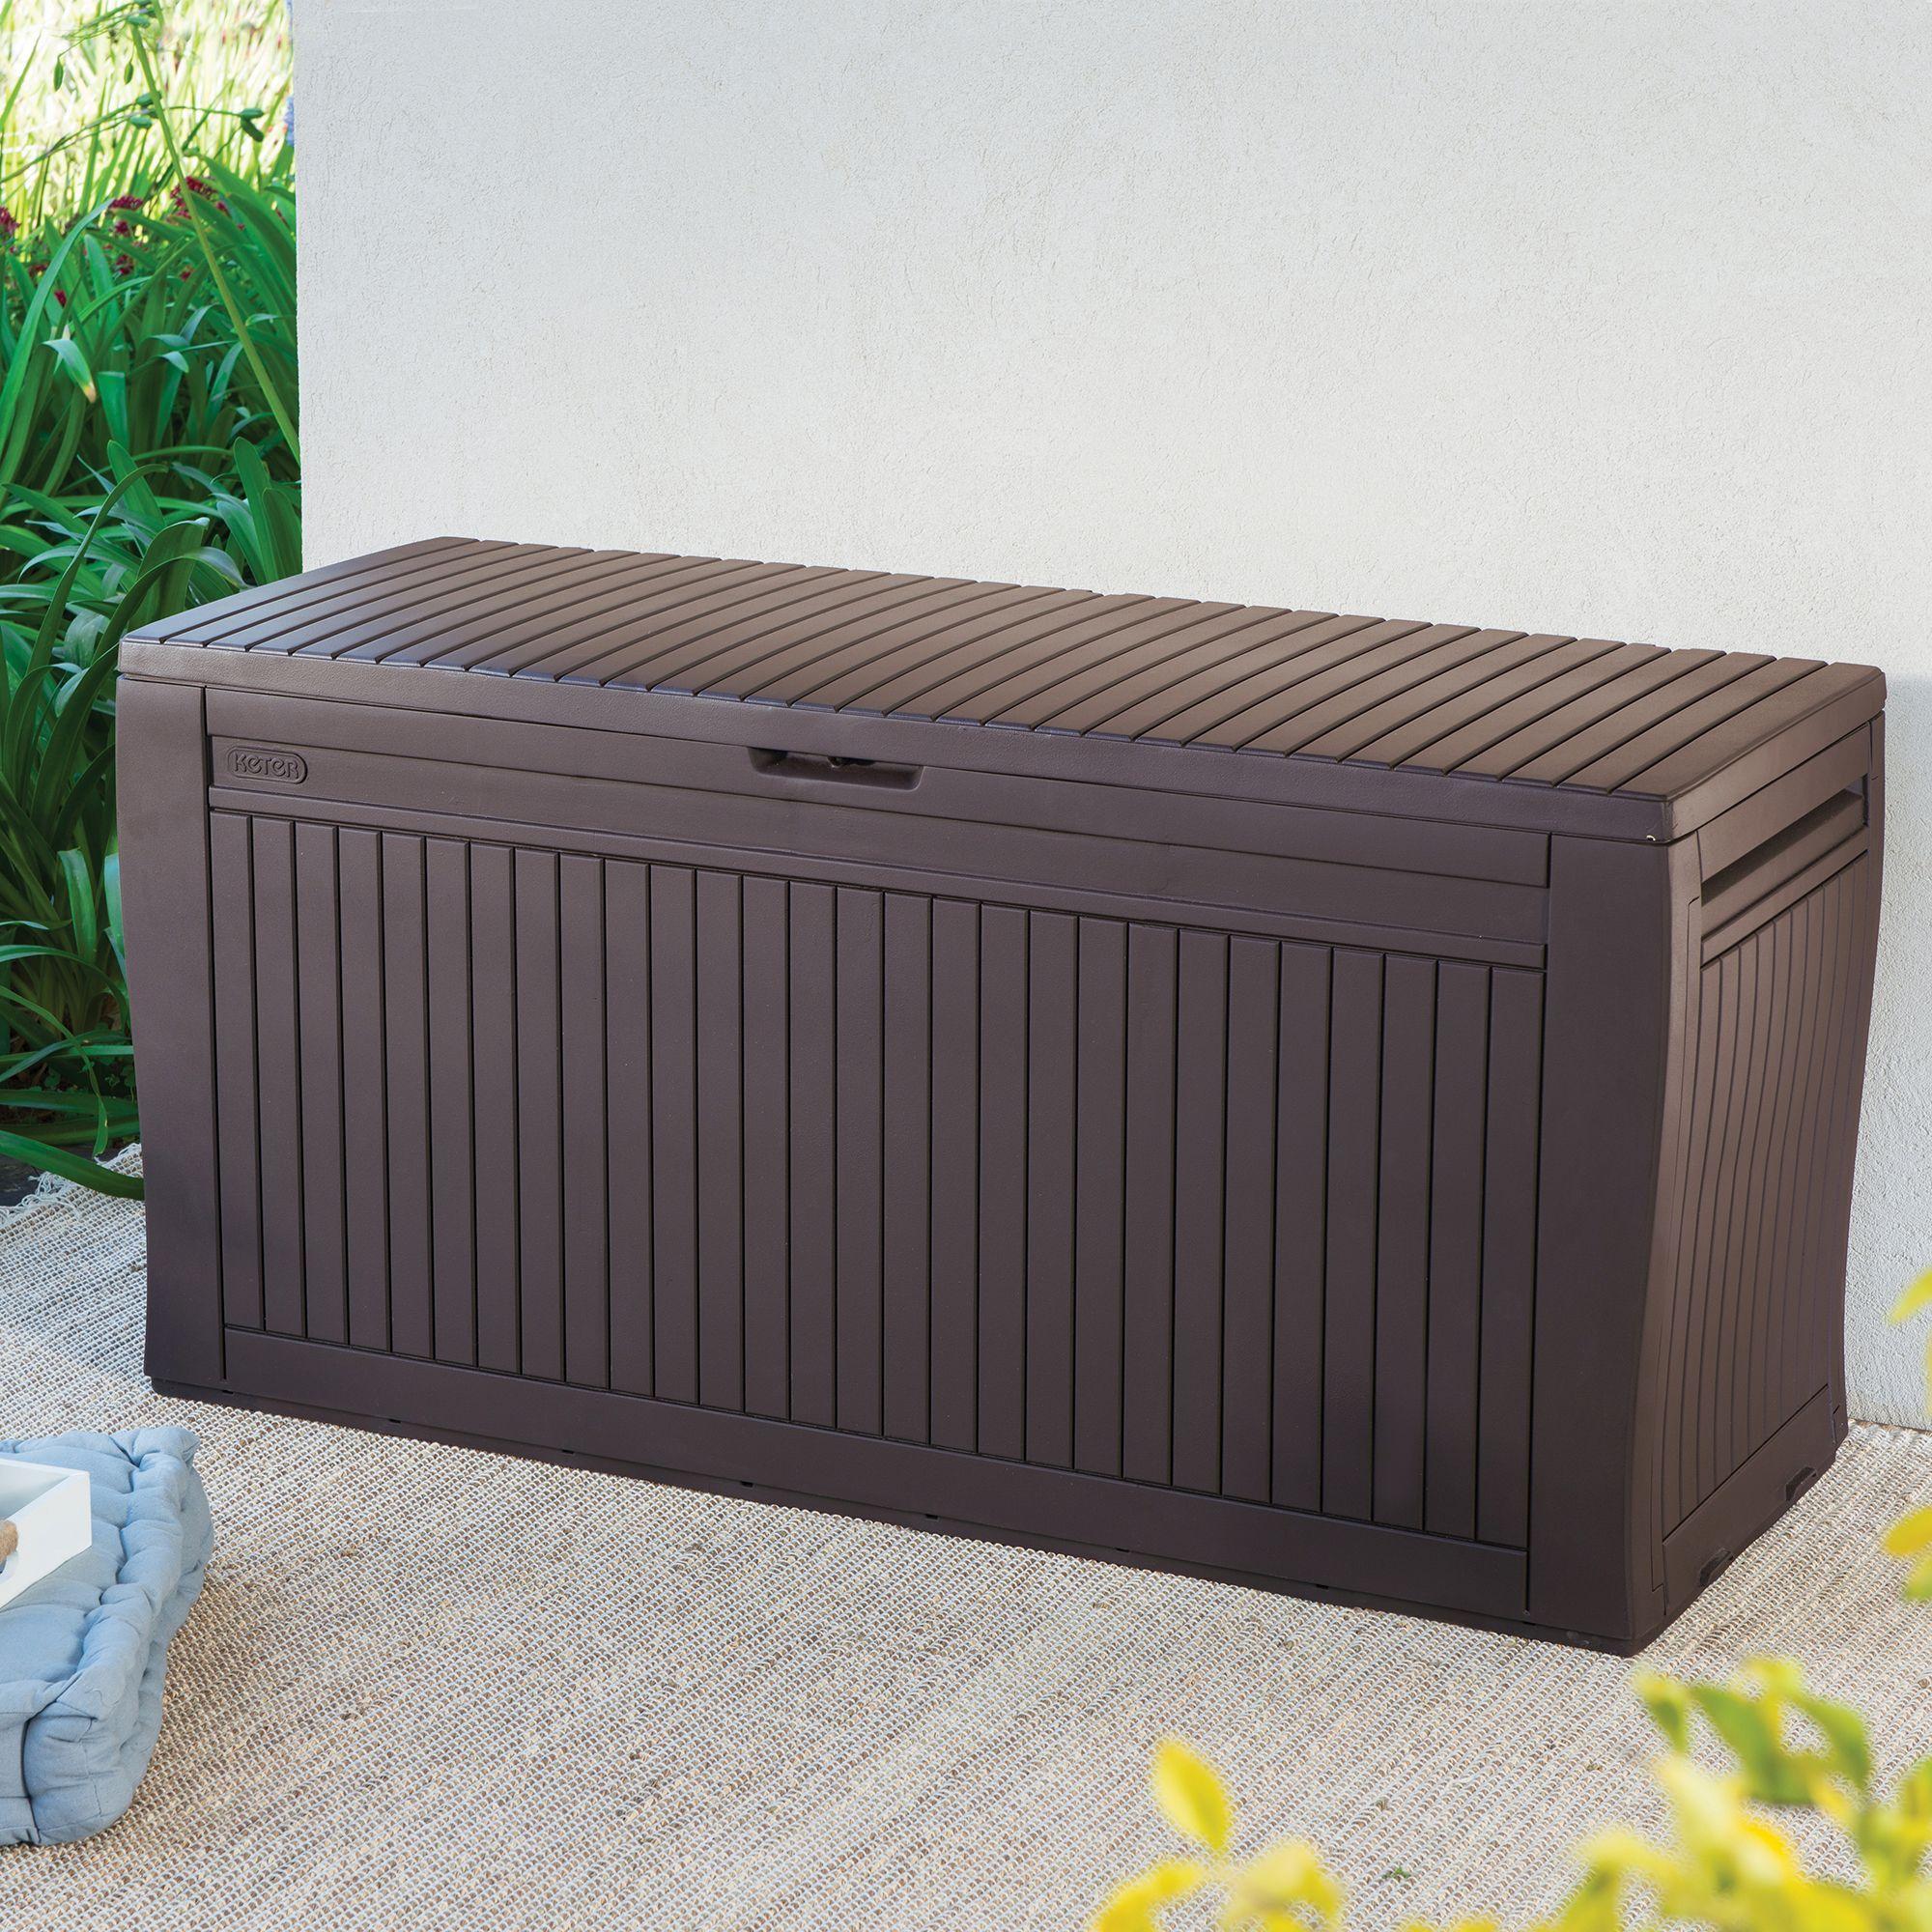 Comfy Wood Effect Plastic Patio Storage Box